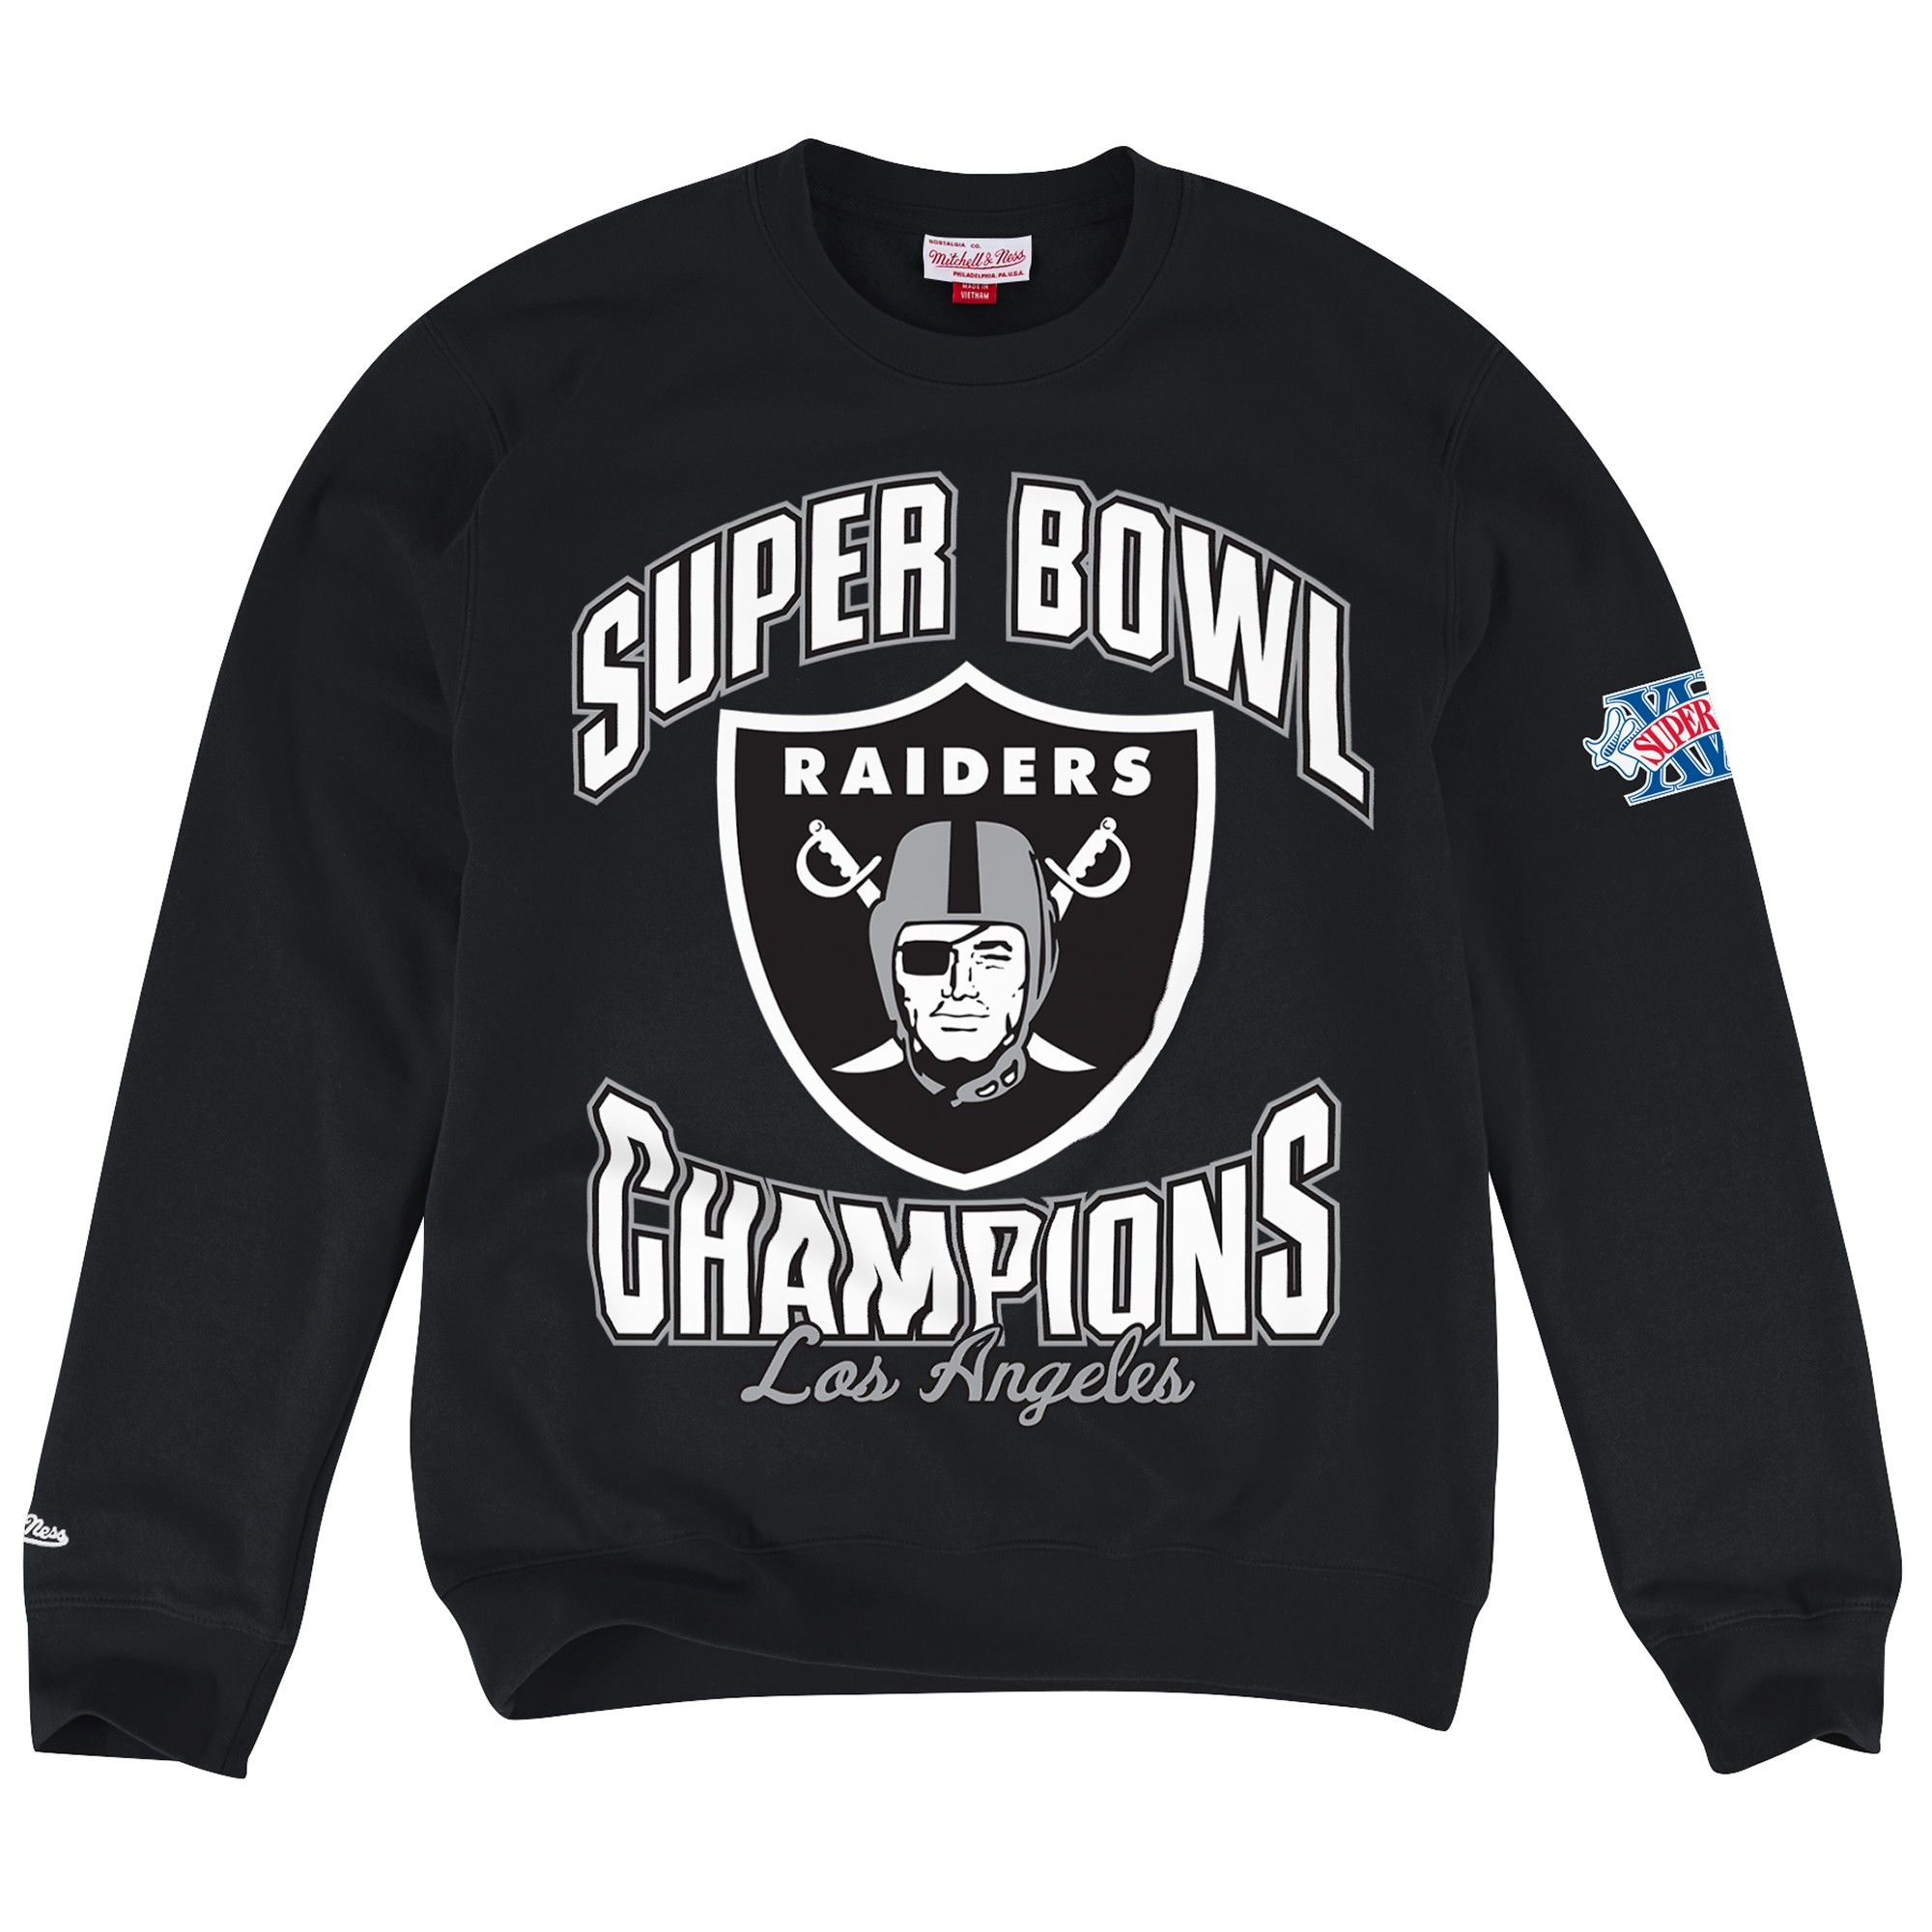 622ab1b7d Team of the Year Crew Los Angeles Raiders - Shop Mitchell   Ness NFL Fleece  and Sweatshirts